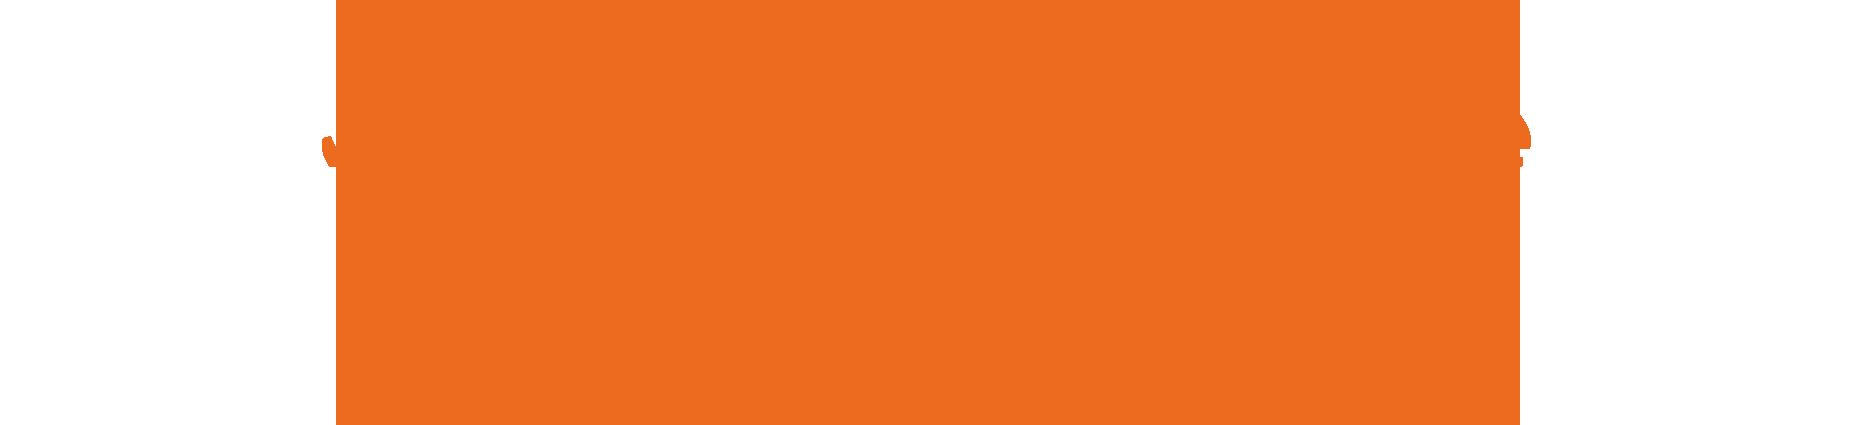 Tacos Corazon Logo